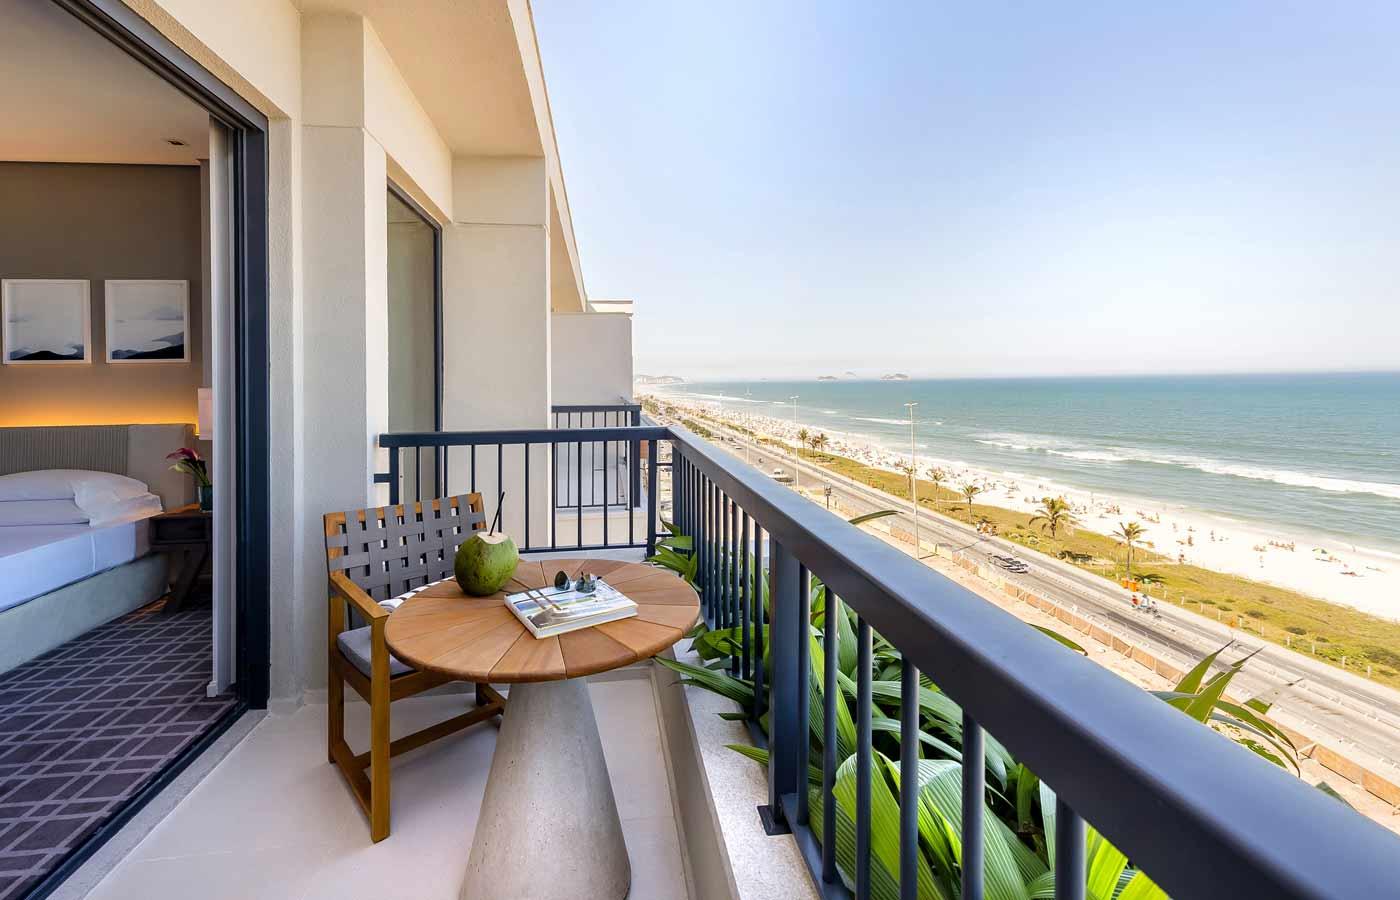 Hotel Grand Hyatt - Luxury holidays to Rio de Janeiro, Brazil